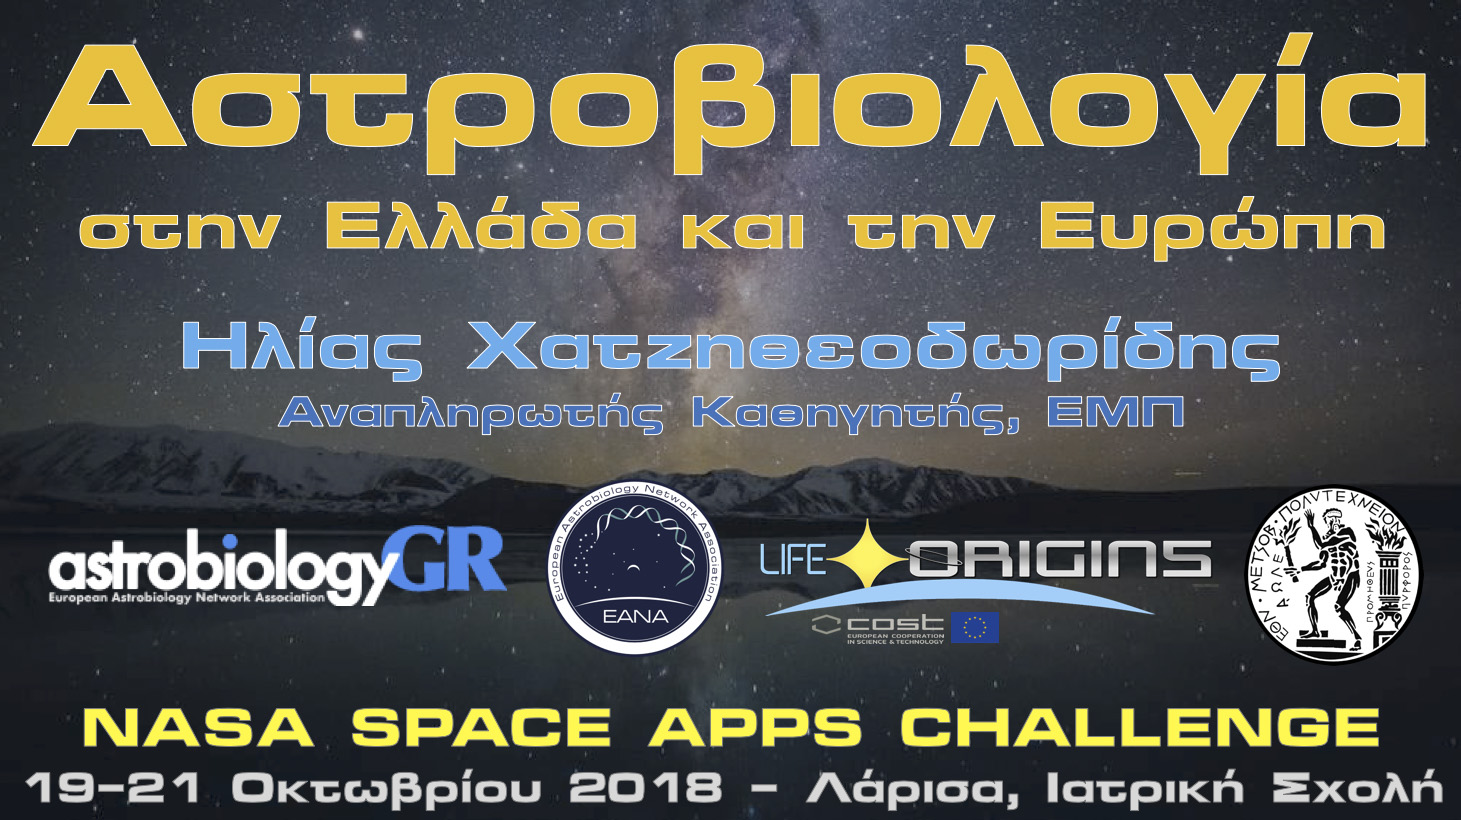 NASA Space Apps Challenge 2018 – Αστροβιολογία στην Ελλάδα